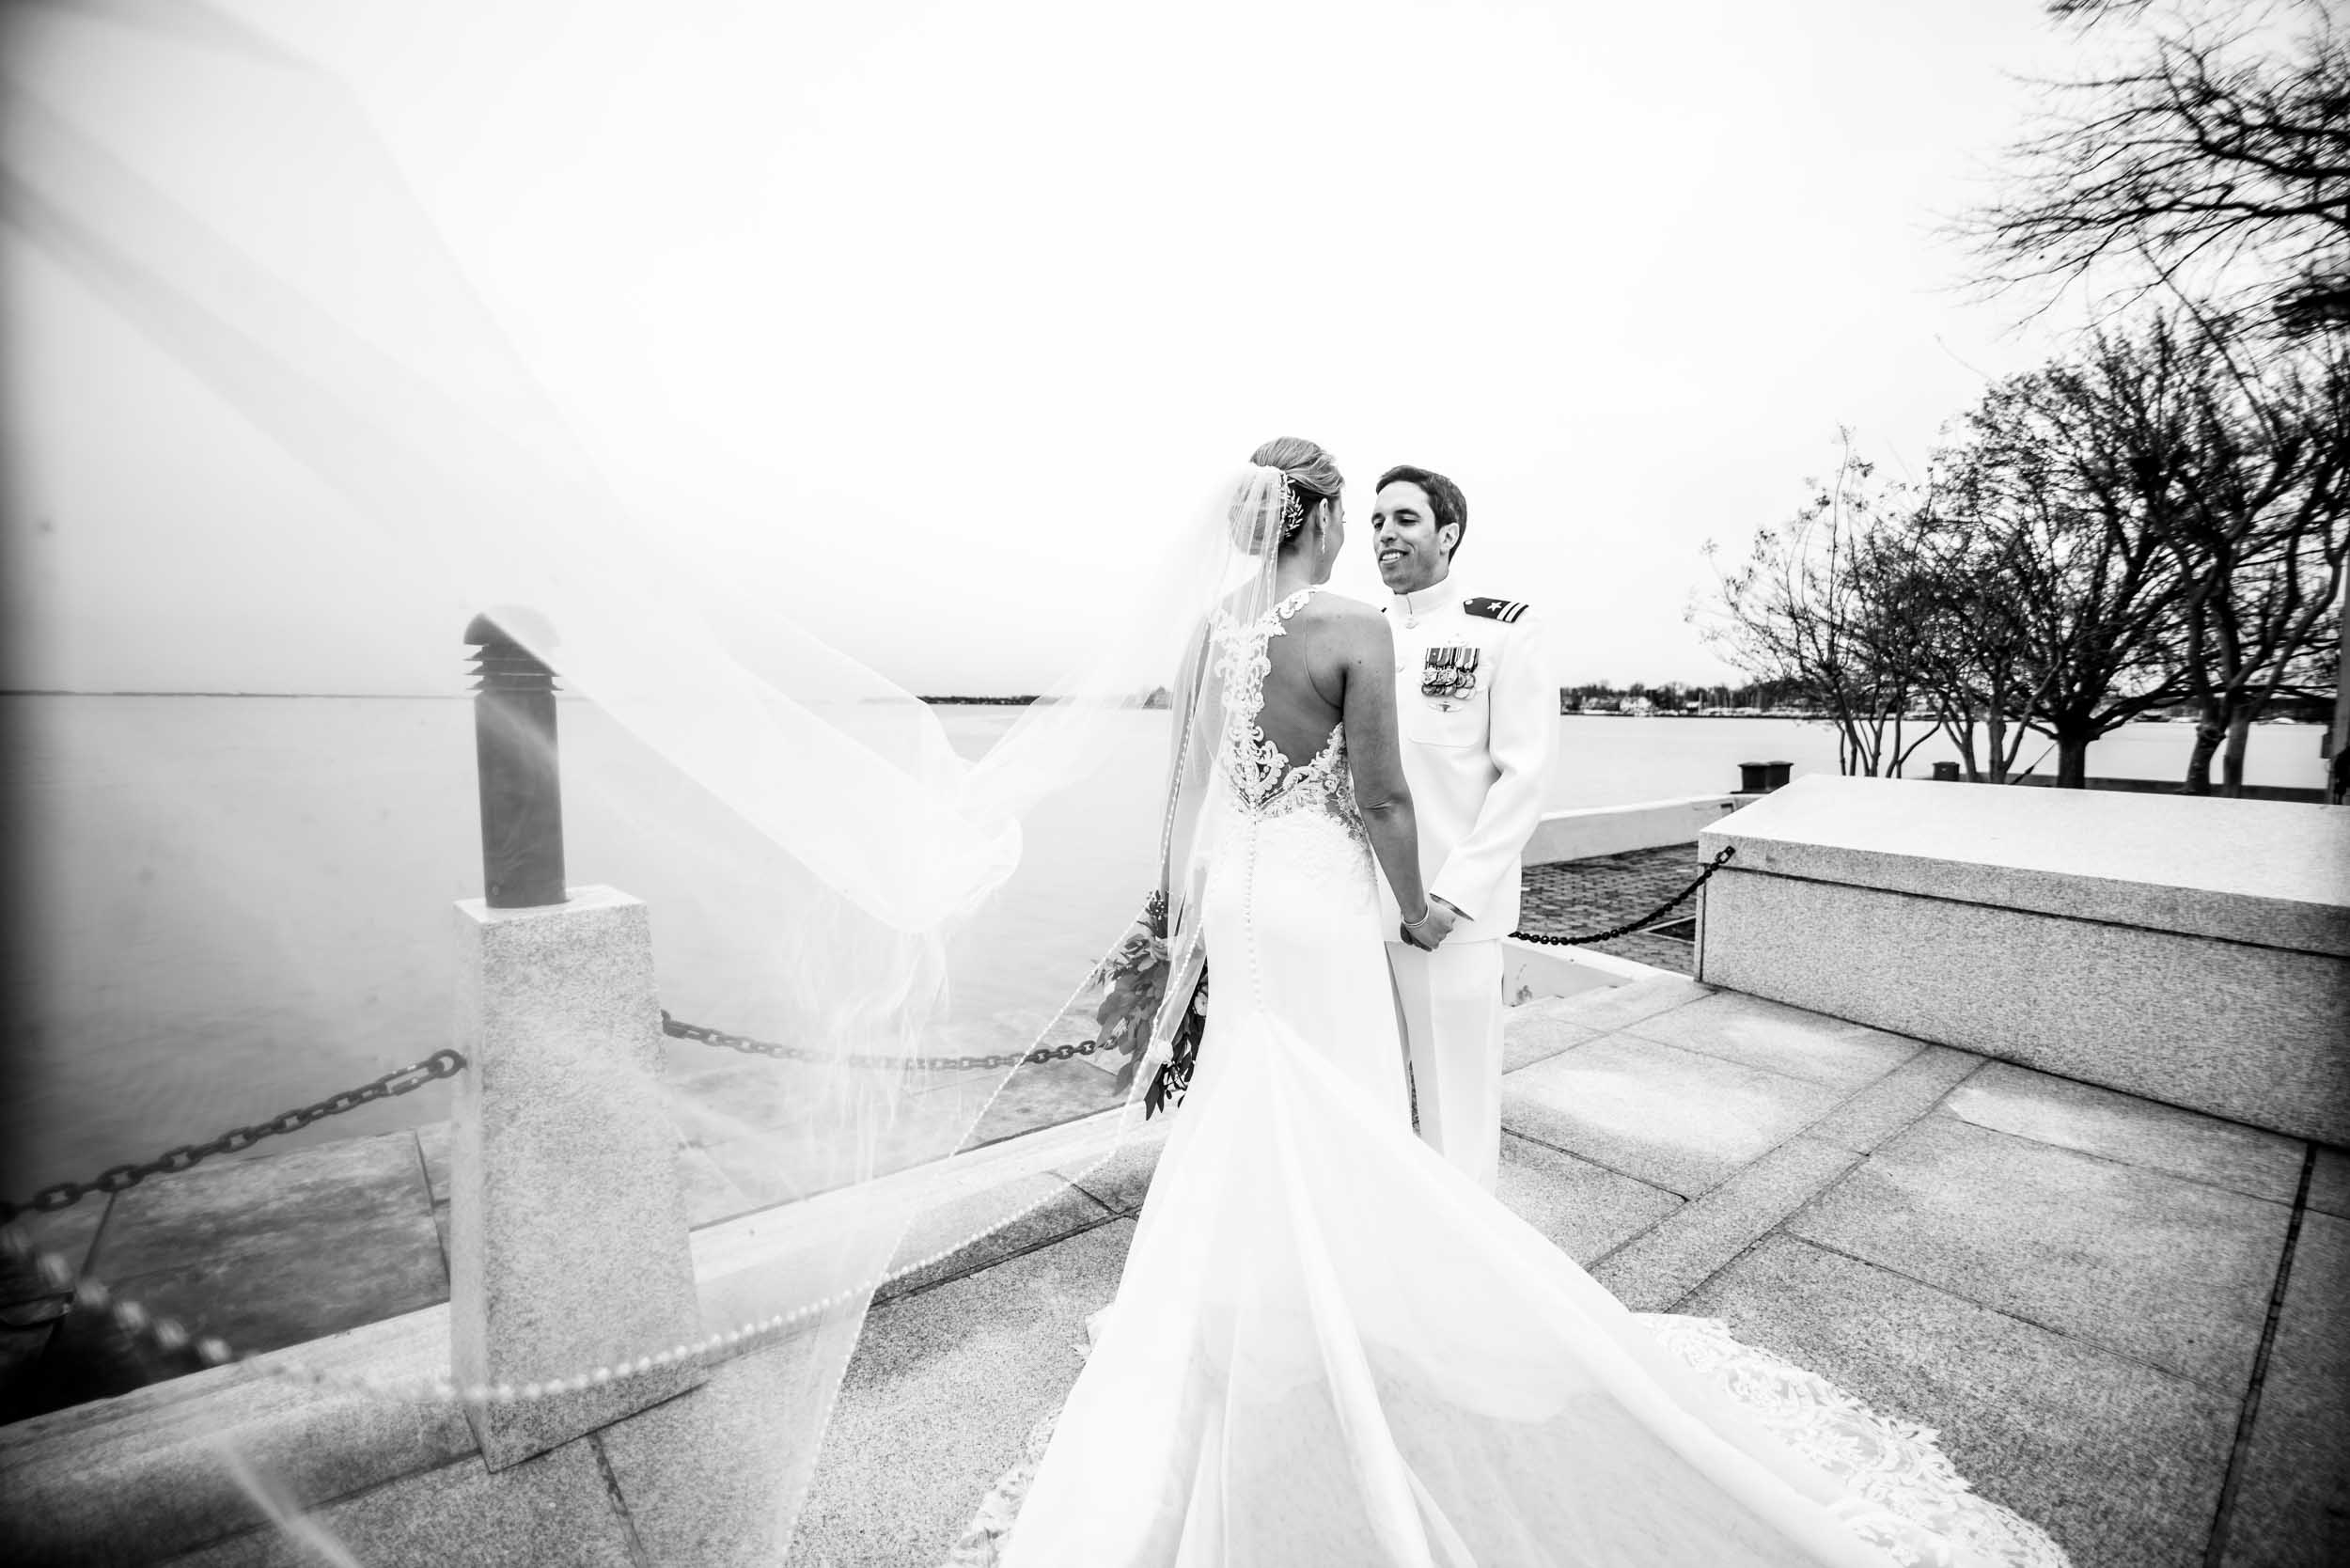 dc+metro+wedding+photographer+vadym+guliuk+photography+wedding+bride+and+groom-2067.jpg